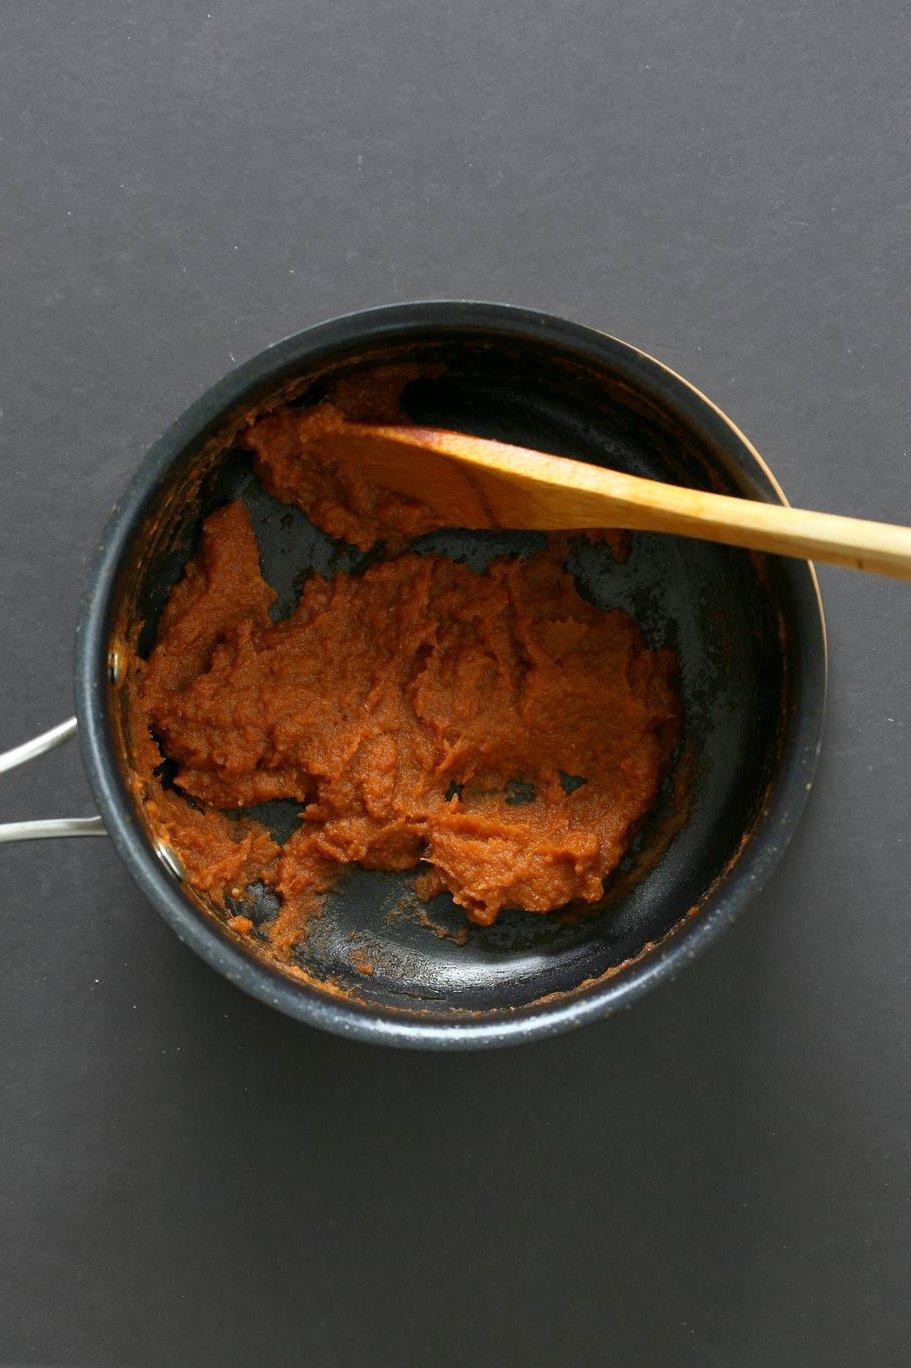 Easy Bhuna Masala Sauce for Indian curries. 1 Pot 30 Minute Masala Sauce. Bhuna means roasted. Use this roasted masala simmer sauce for quick curries. Add non dairy milk or cashew cream or yogurt. #Vegan #Glutenfree #Recipe #VeganRicha | VeganRicha.com